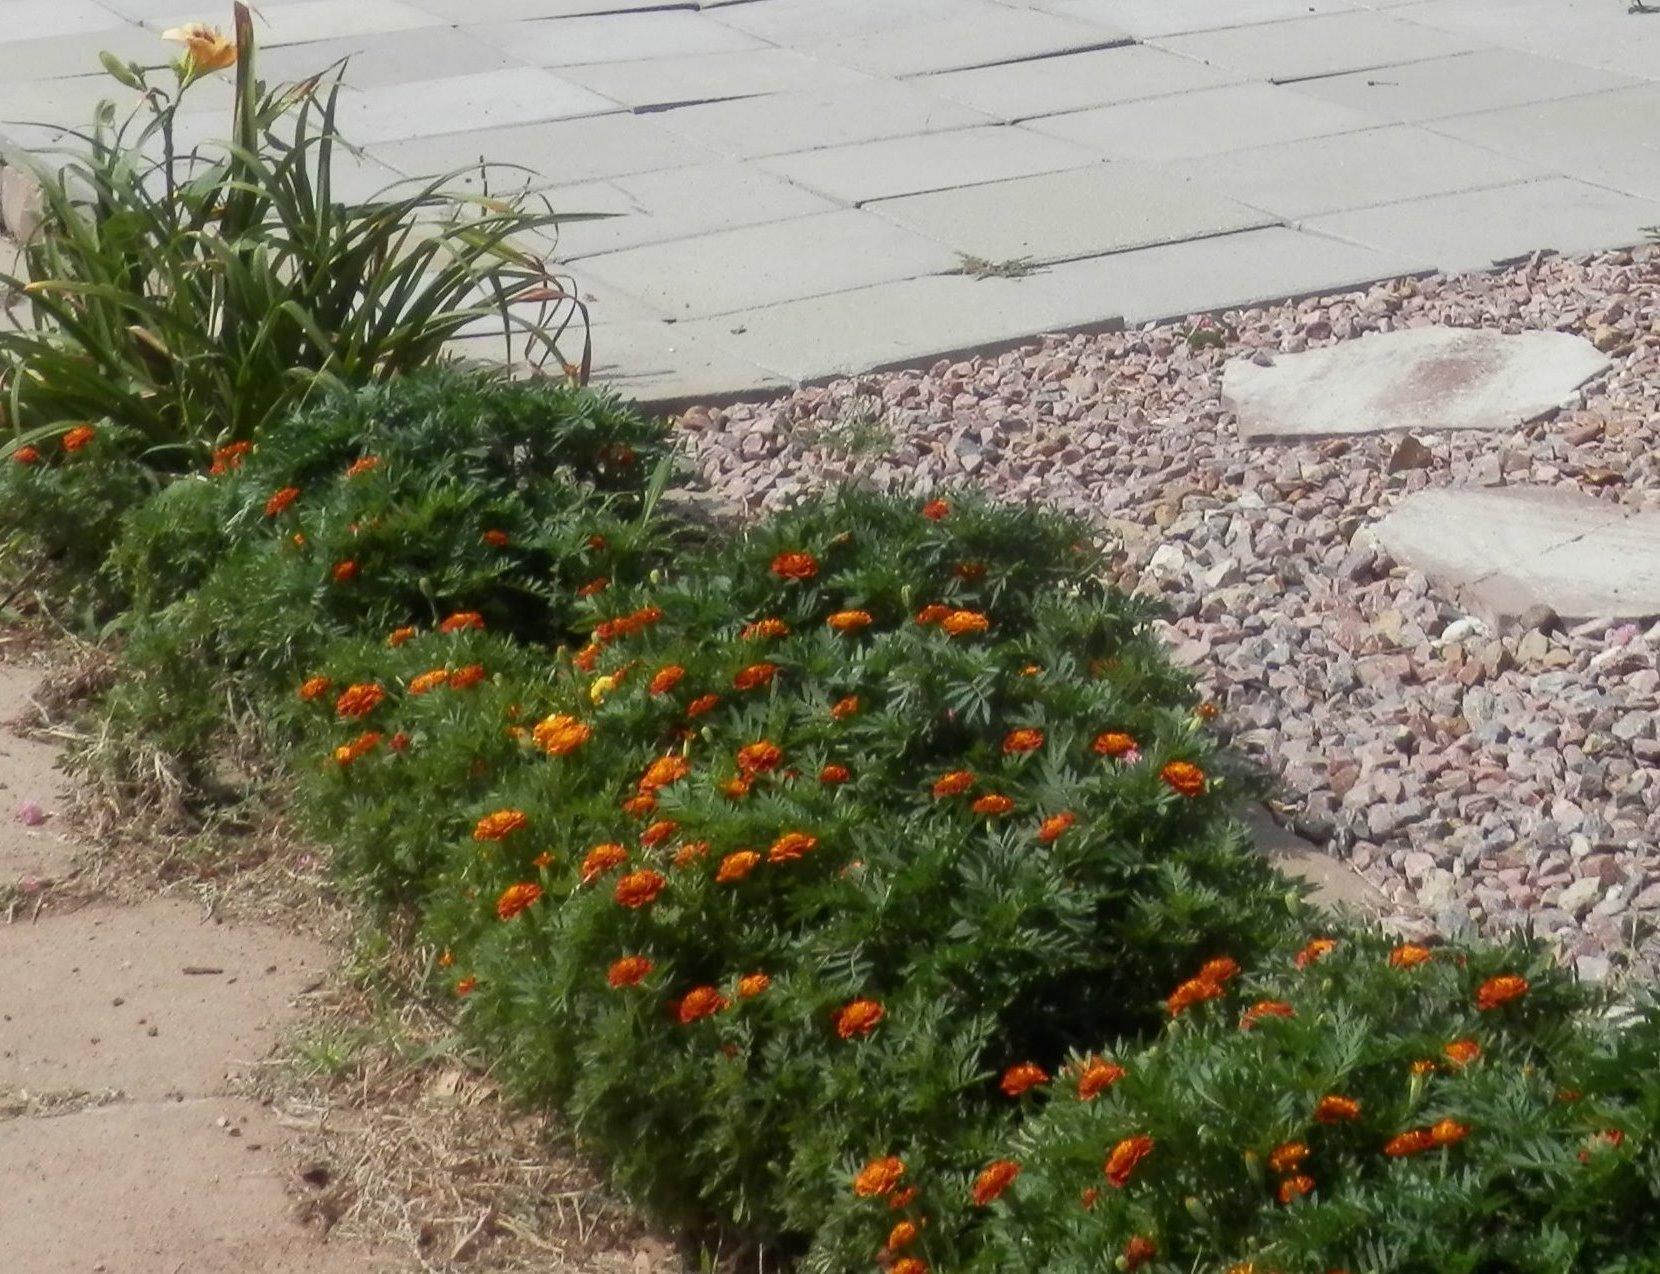 a row of orange marigolds